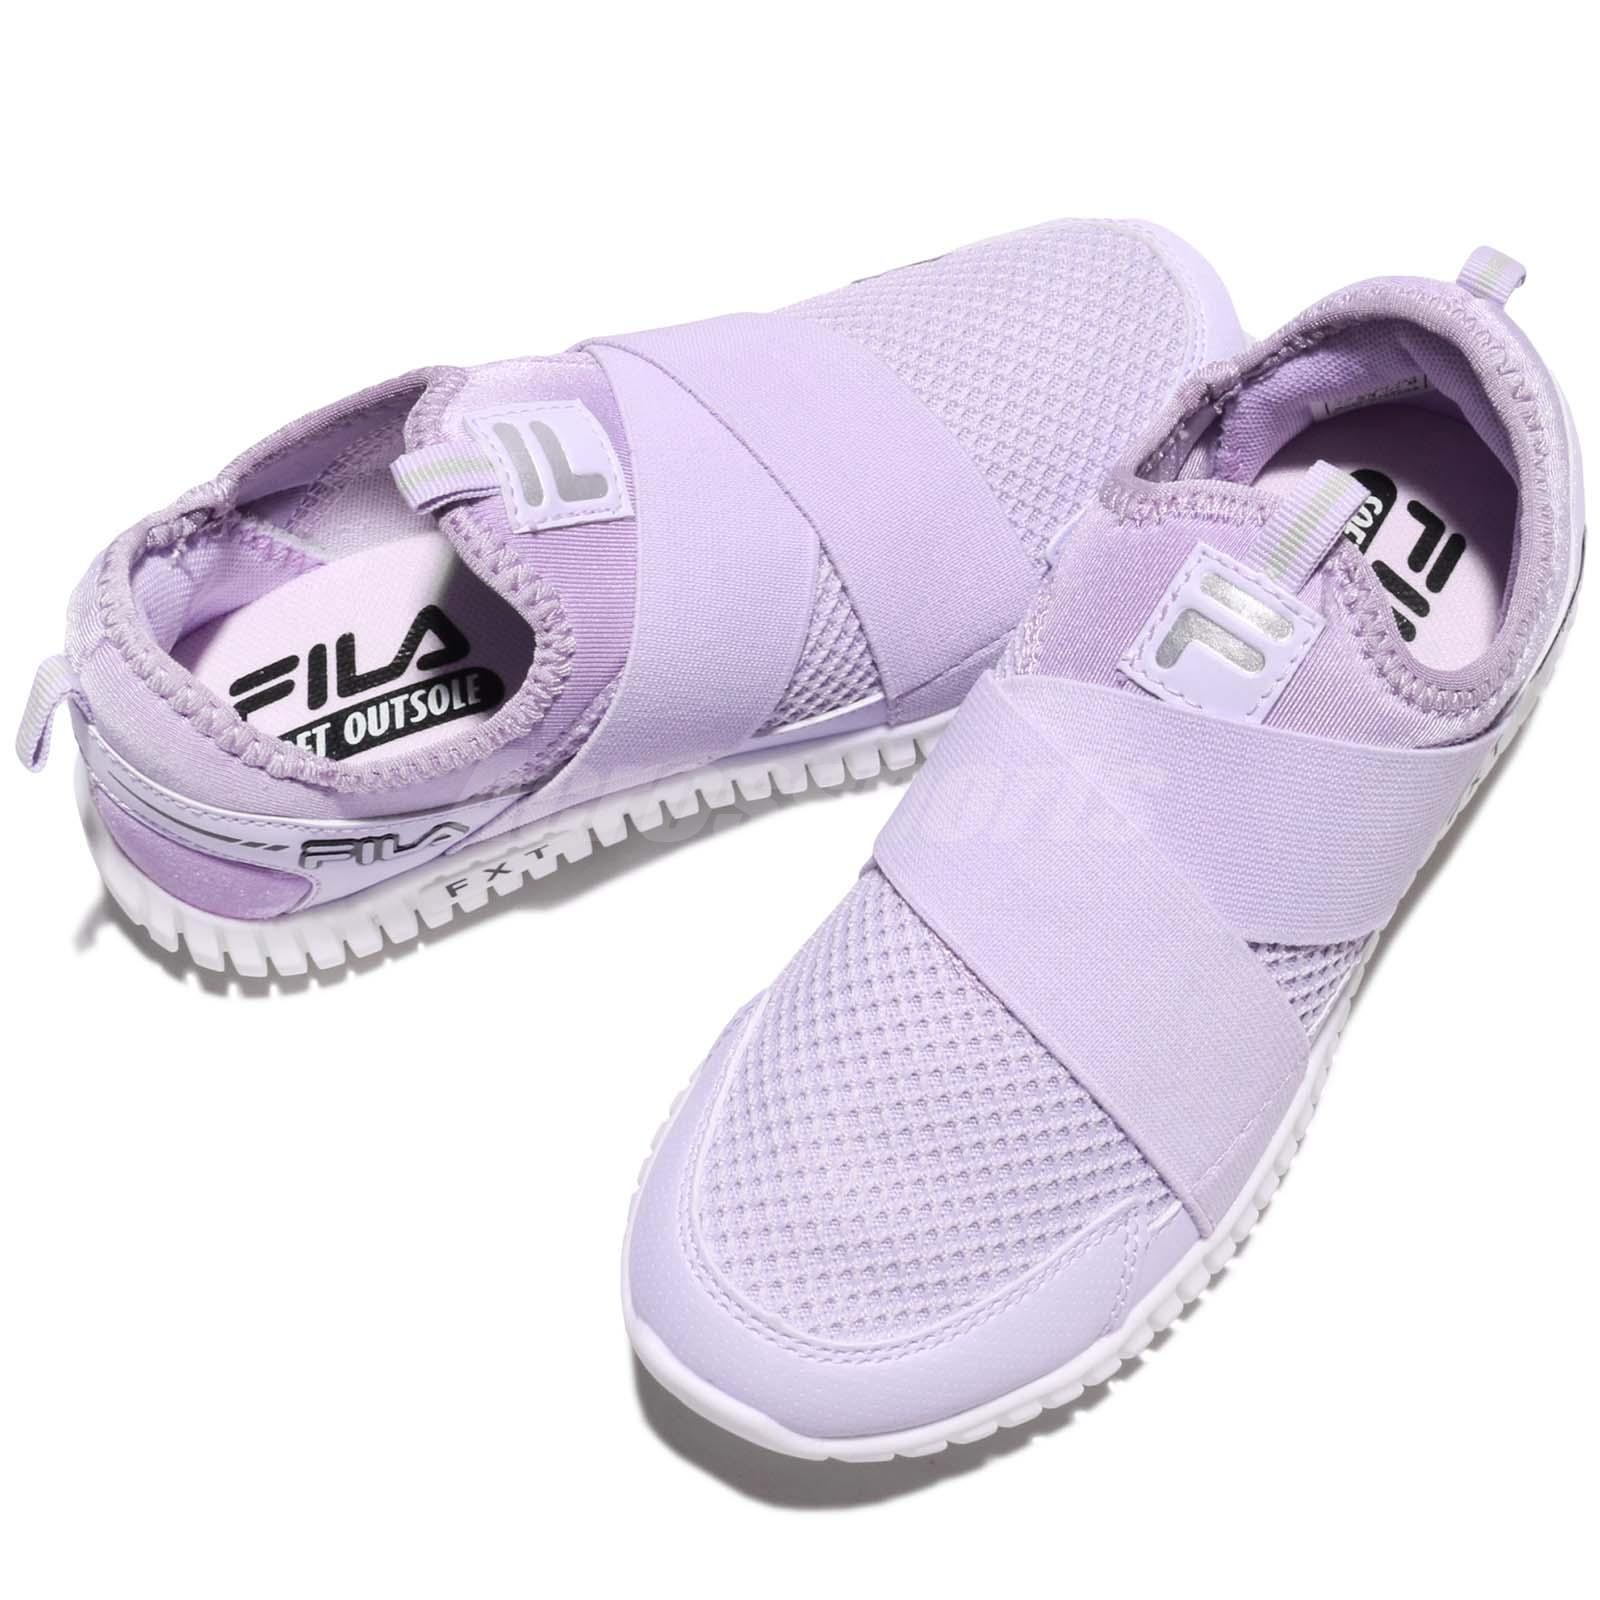 87951baf7272 Fila F909R Venus Strap Purple White Women Slip On Walking Shoes ...